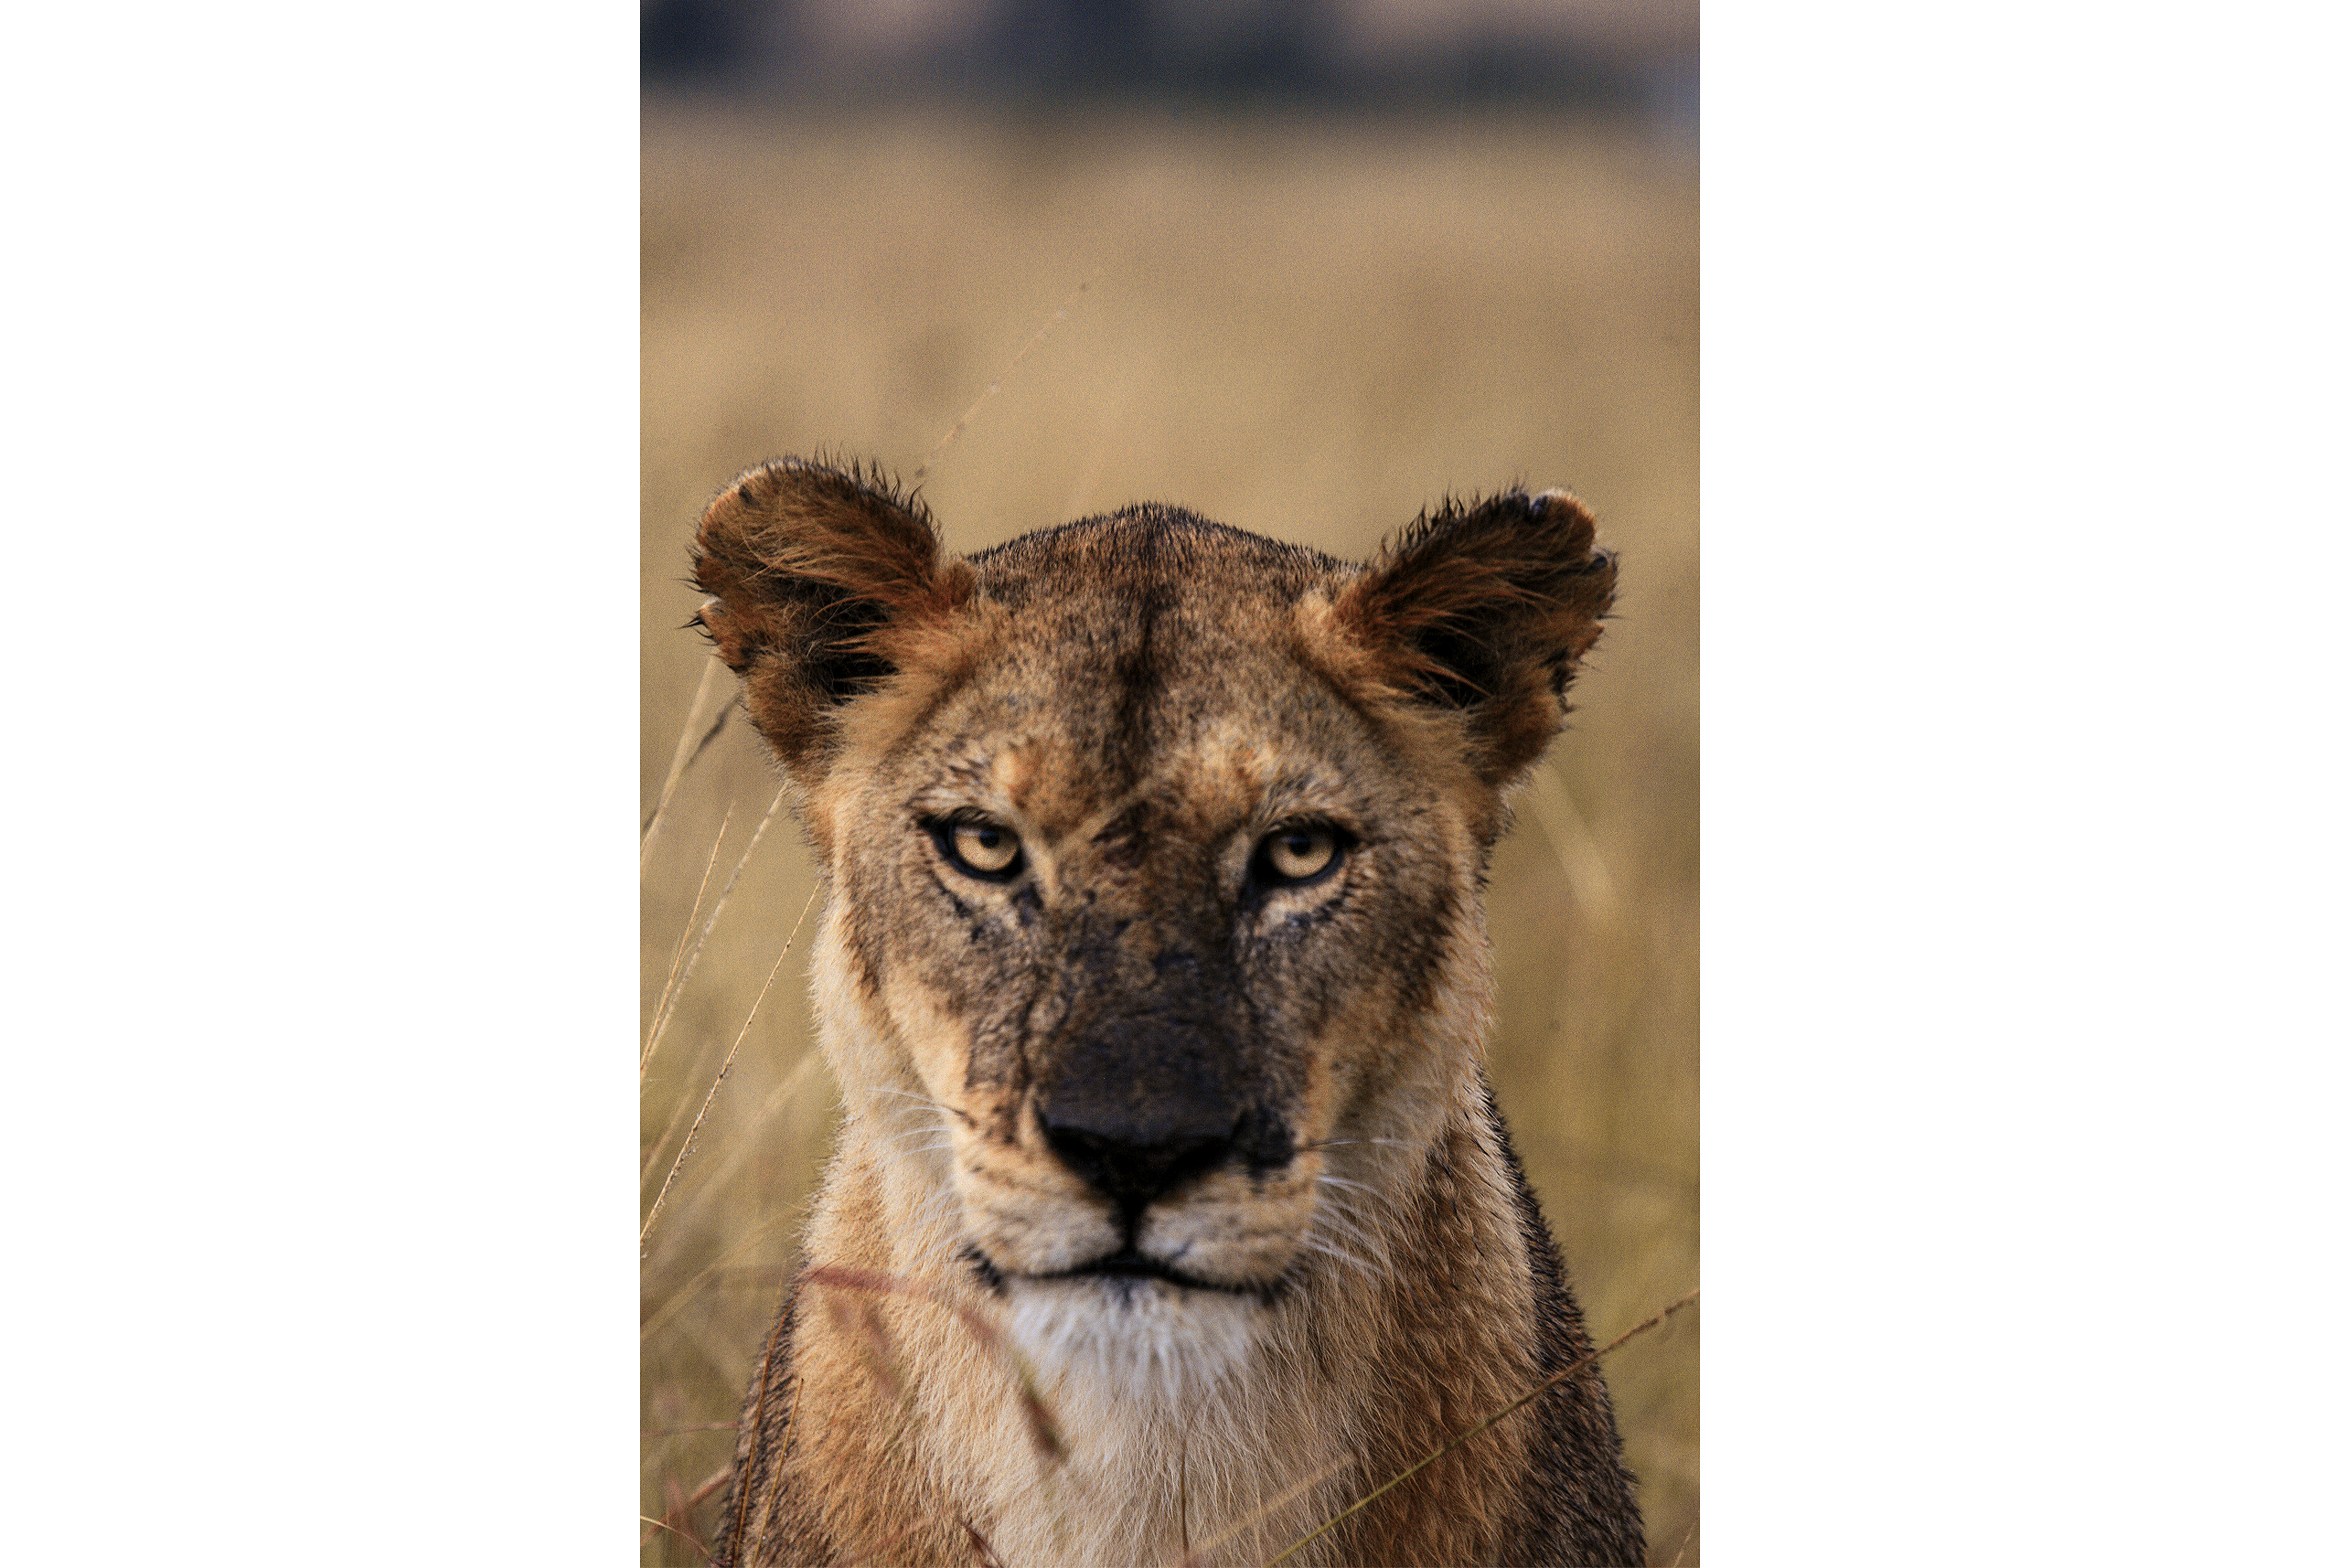 roaring_rain_Jenia_lions_masai_mara_photo_by_flavio_oliva_04